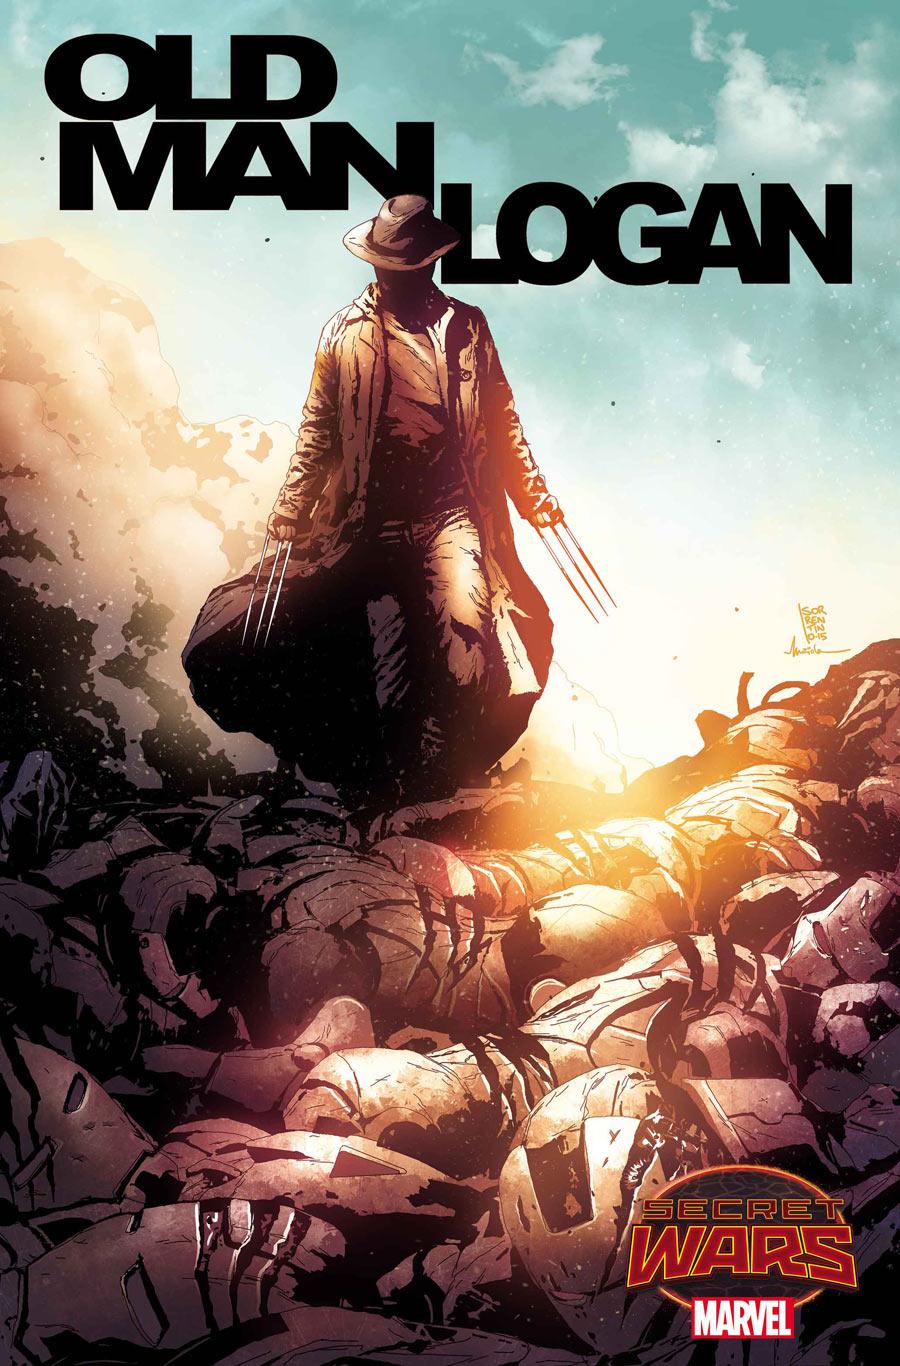 OLD-MAN-LOGAN-3-7deef